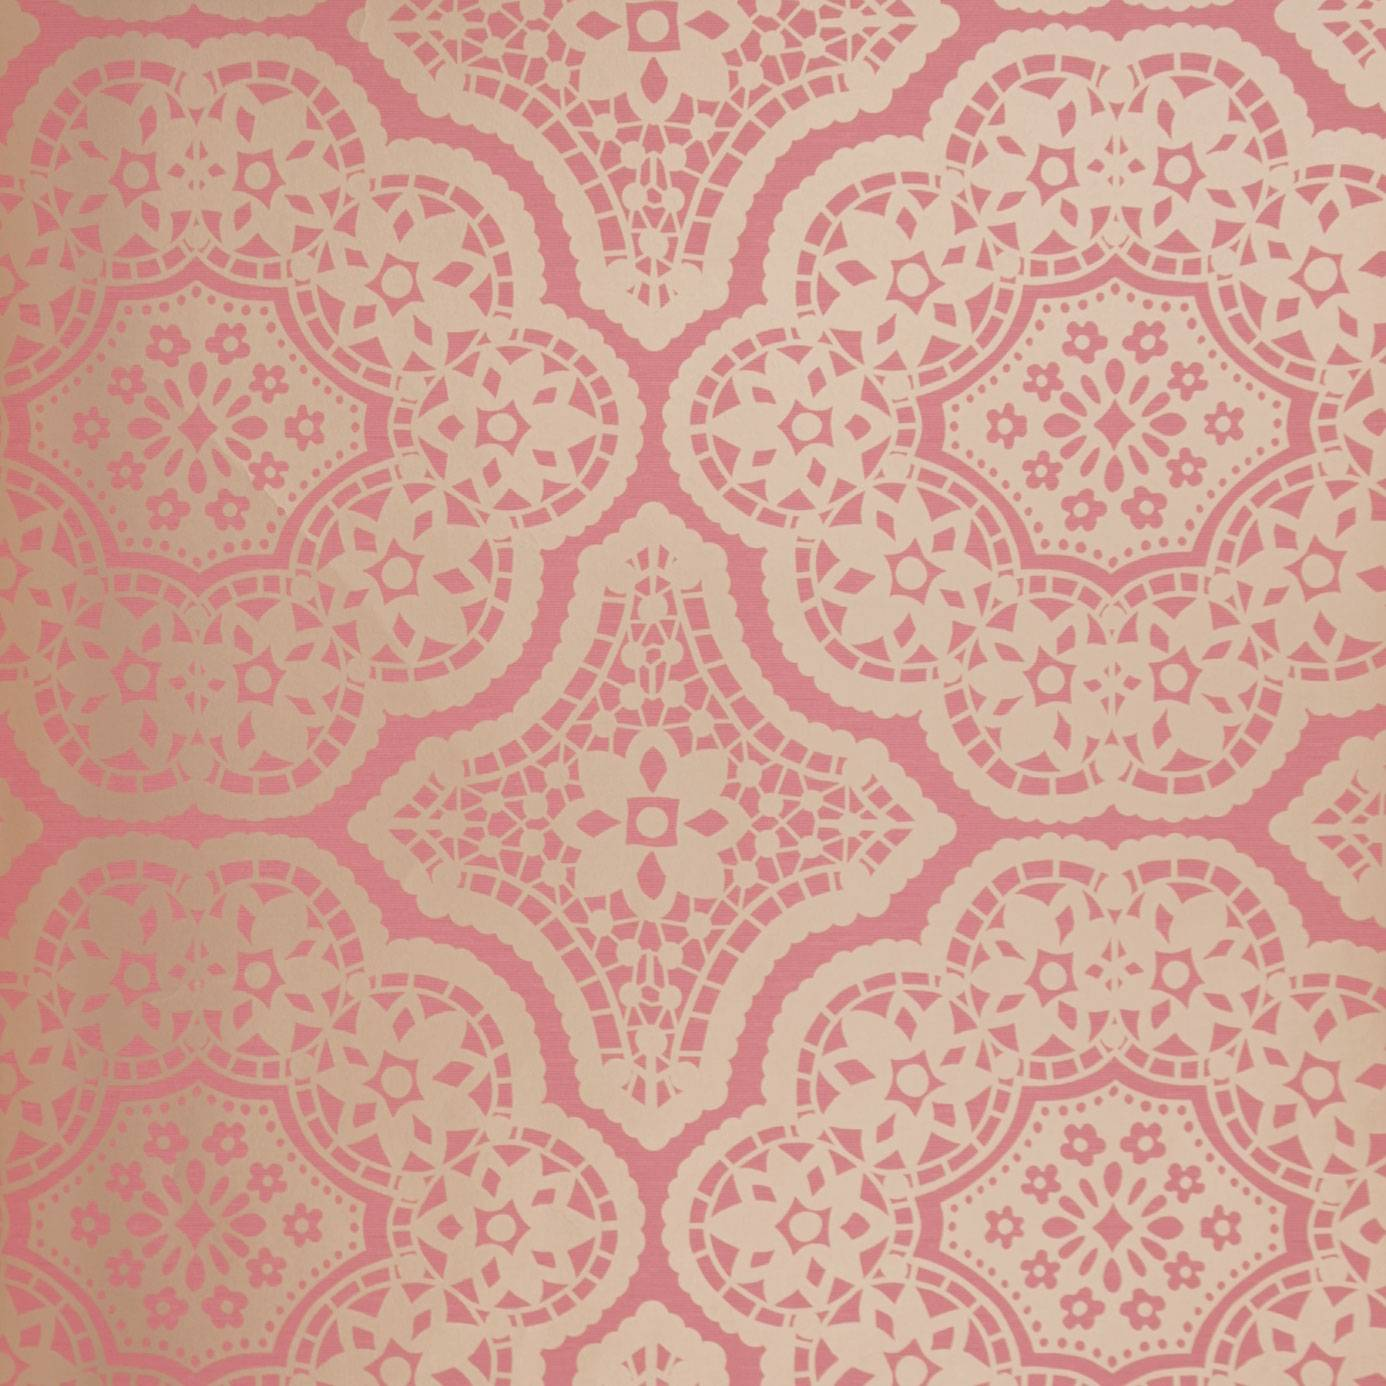 Home Wallpapers Harlequin Romanie Fabric Wallpaper Mirela Wallpaper 1386x1386